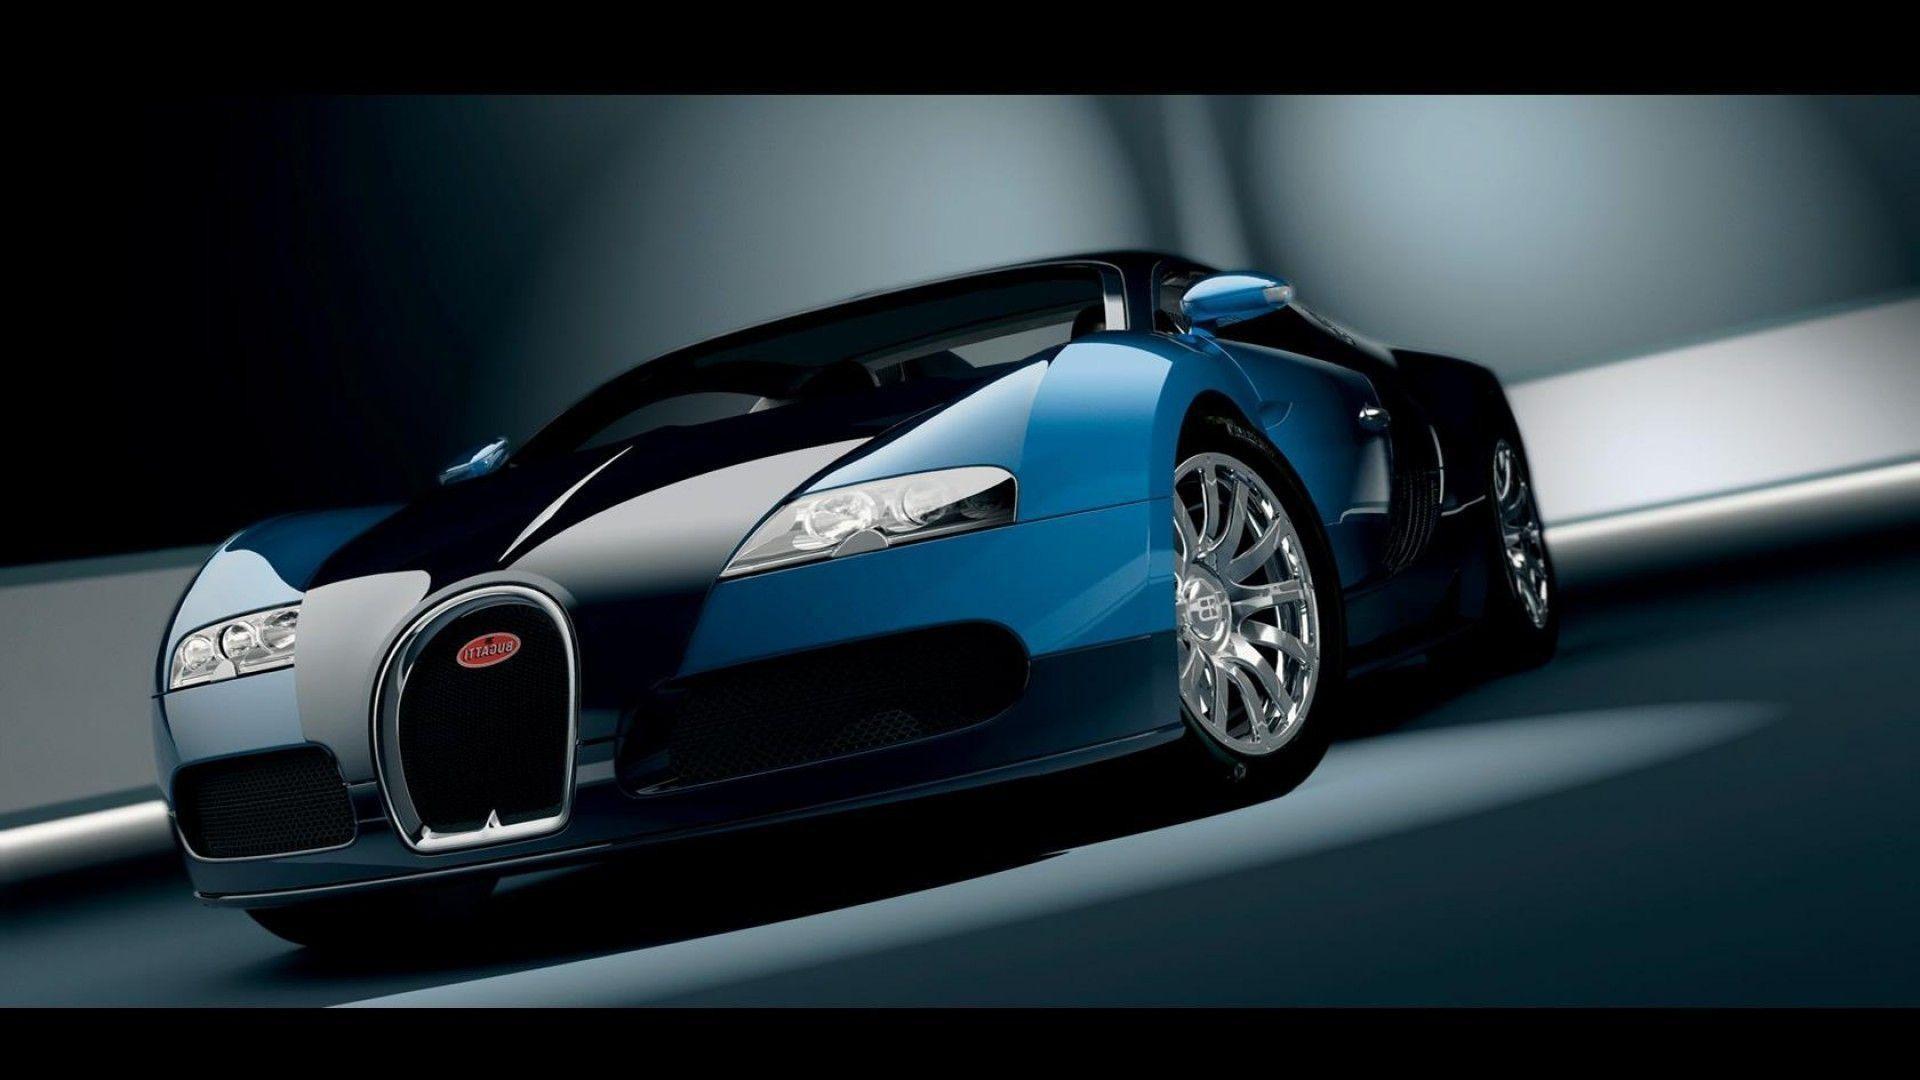 Bugatti Car Wallpaper Albumccars Cars Images Collection